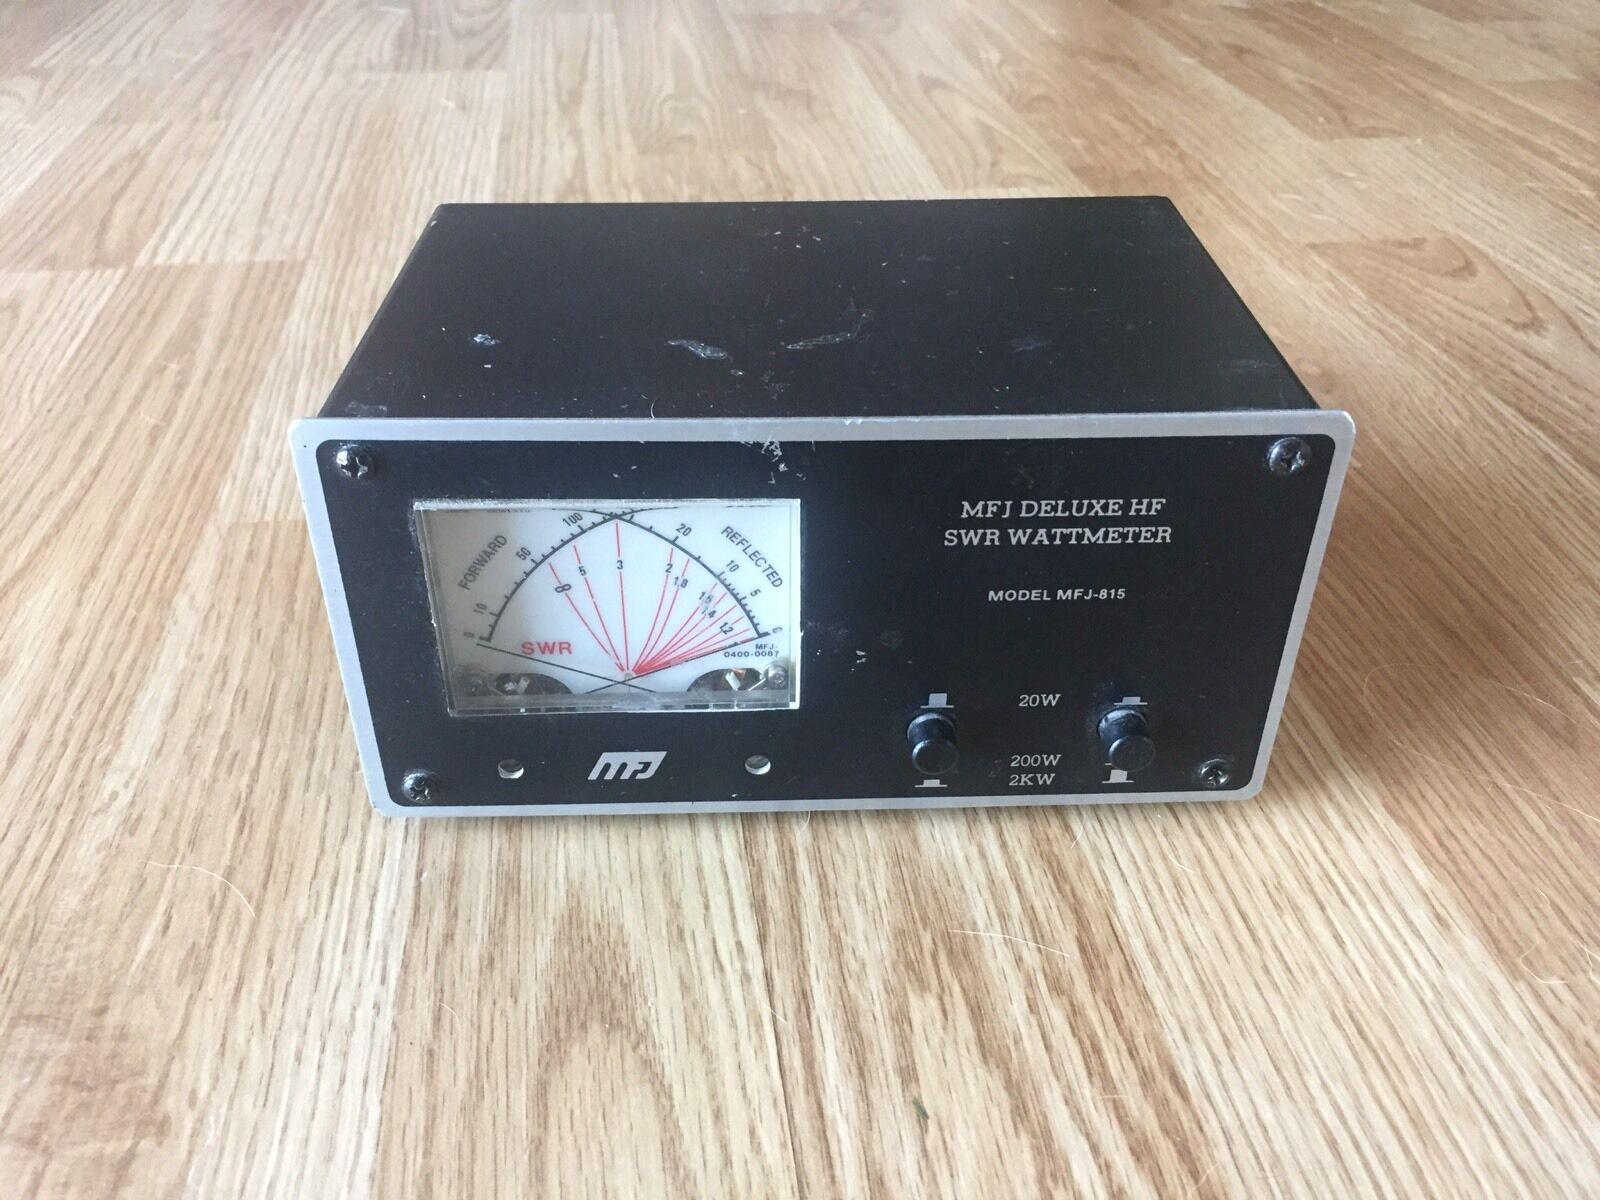 jonesrj8691 MFJ Deluxe HF SWR Wattmeter MFJ-815